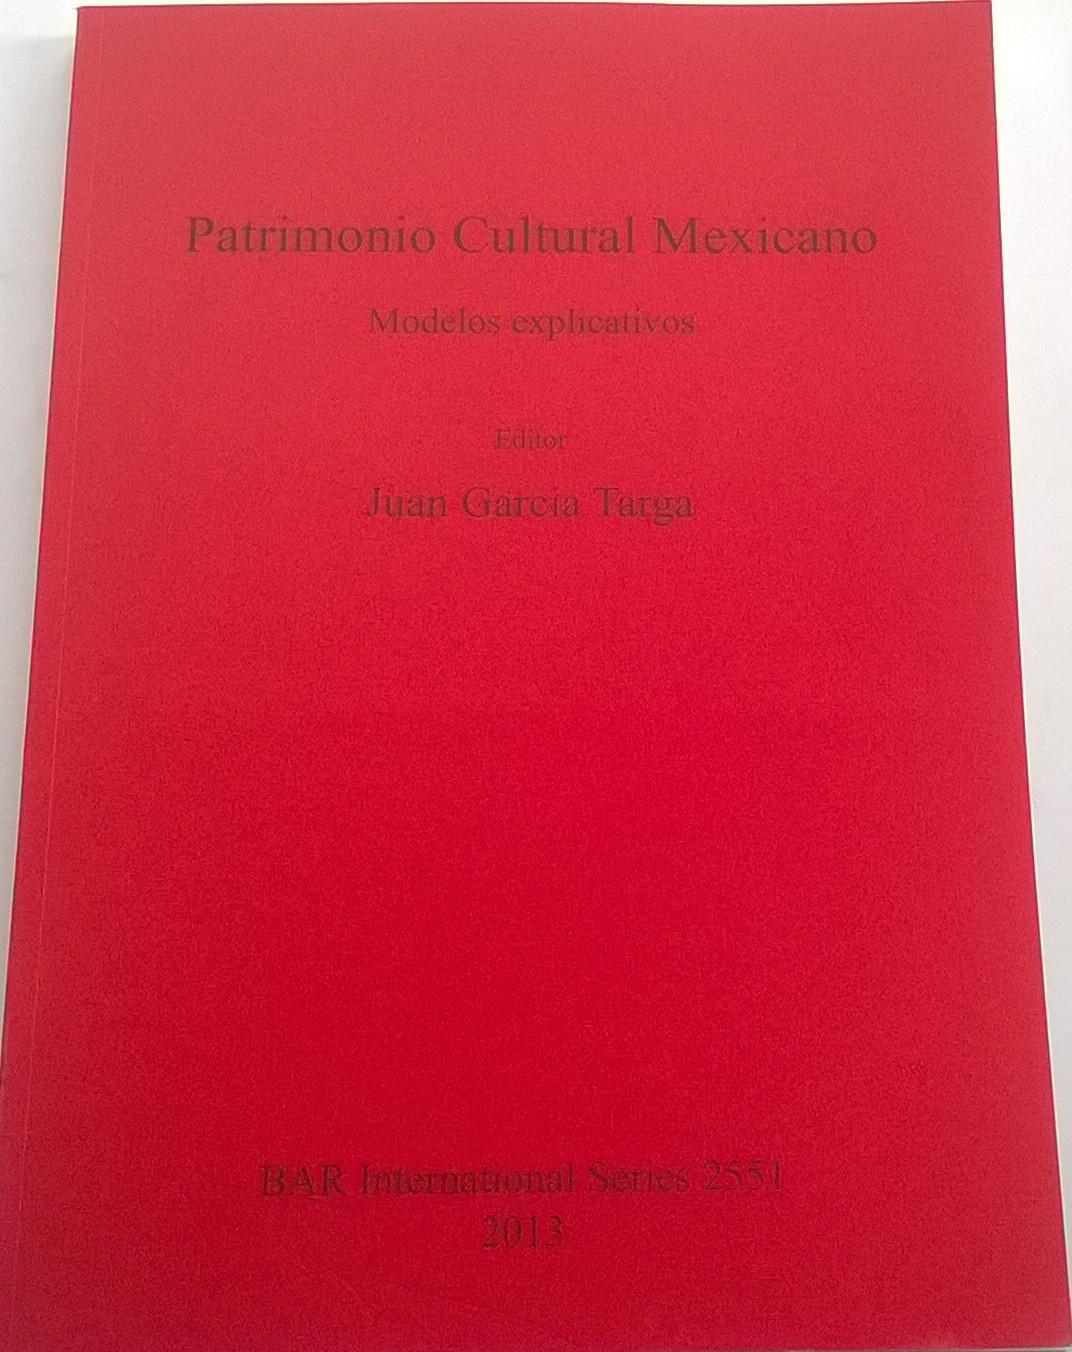 Patrimonio Cultural Mexicano :Modelos explicativos BAR International Series 2551, Targa, Juan Garcia ;(ed)